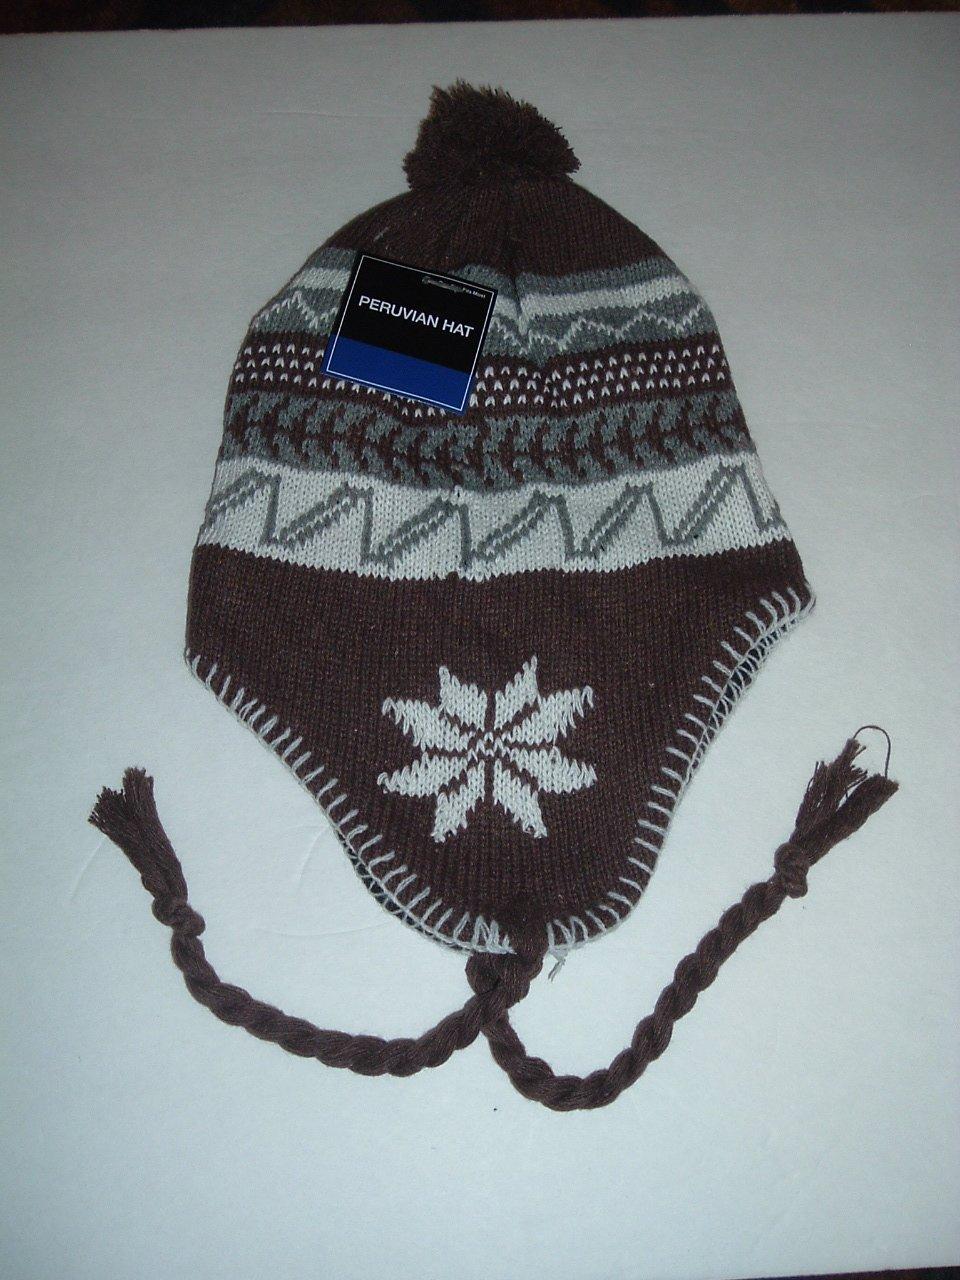 Adult Peruvian Hats